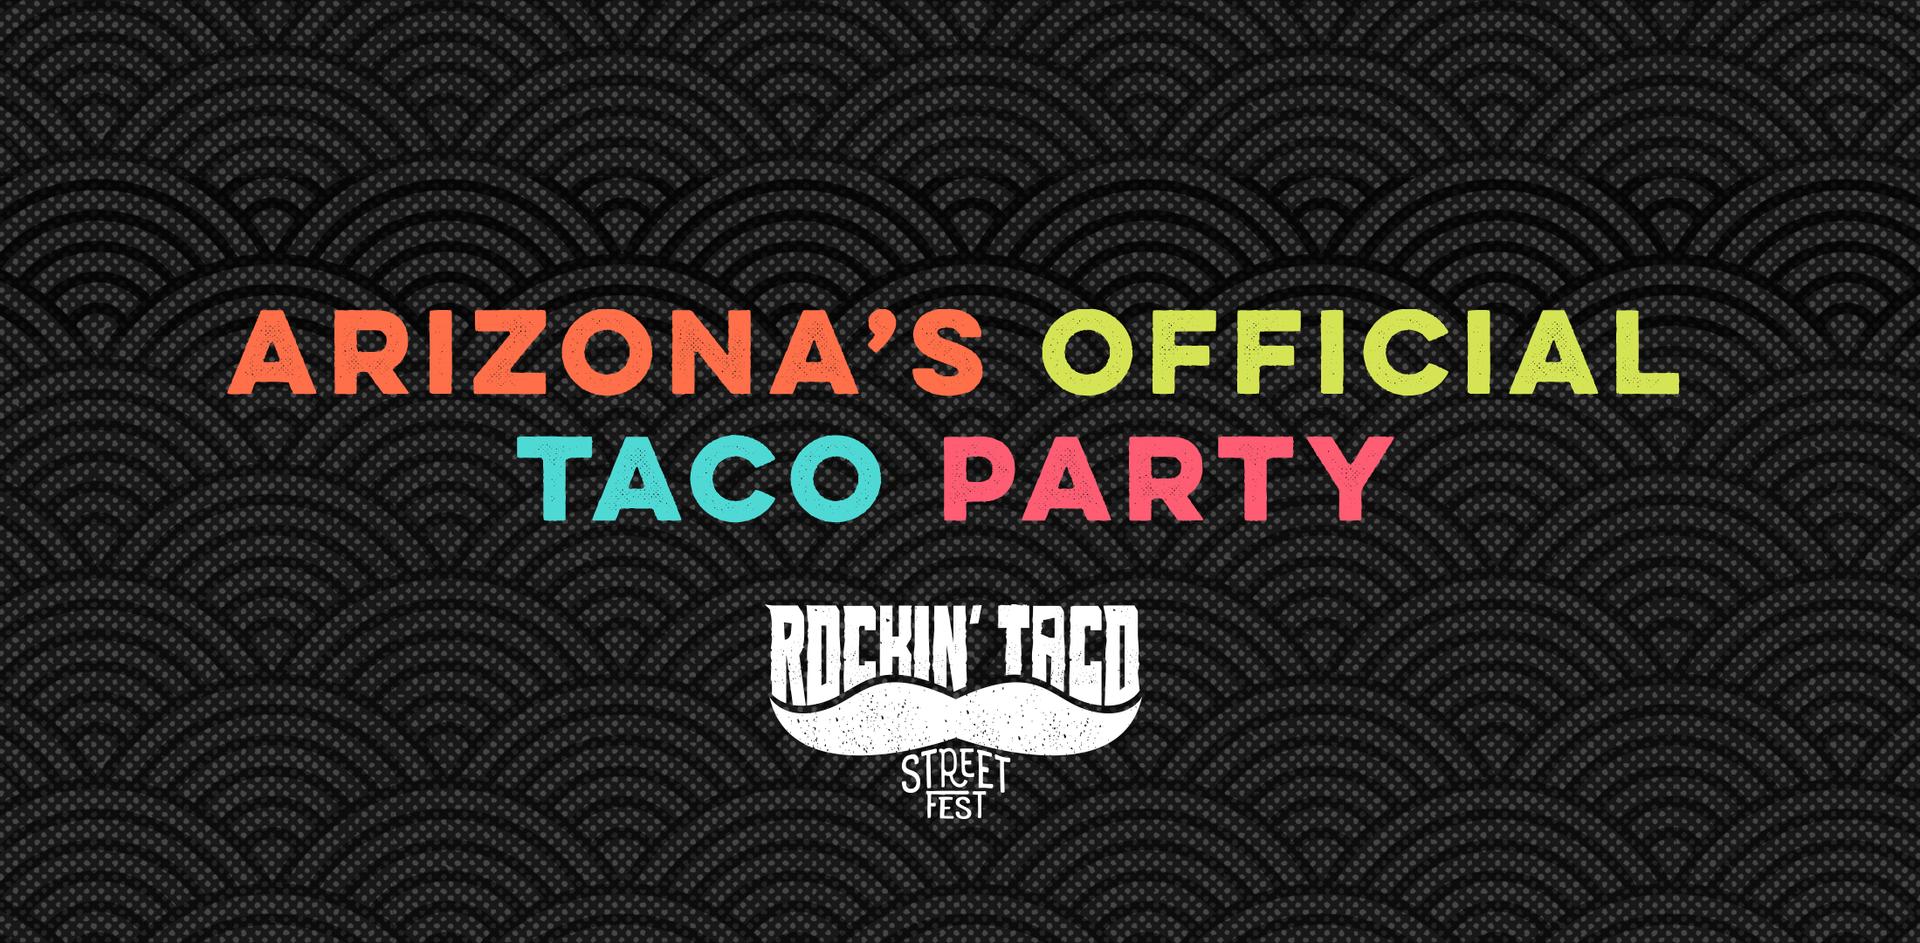 Rockin' Taco Street Fest